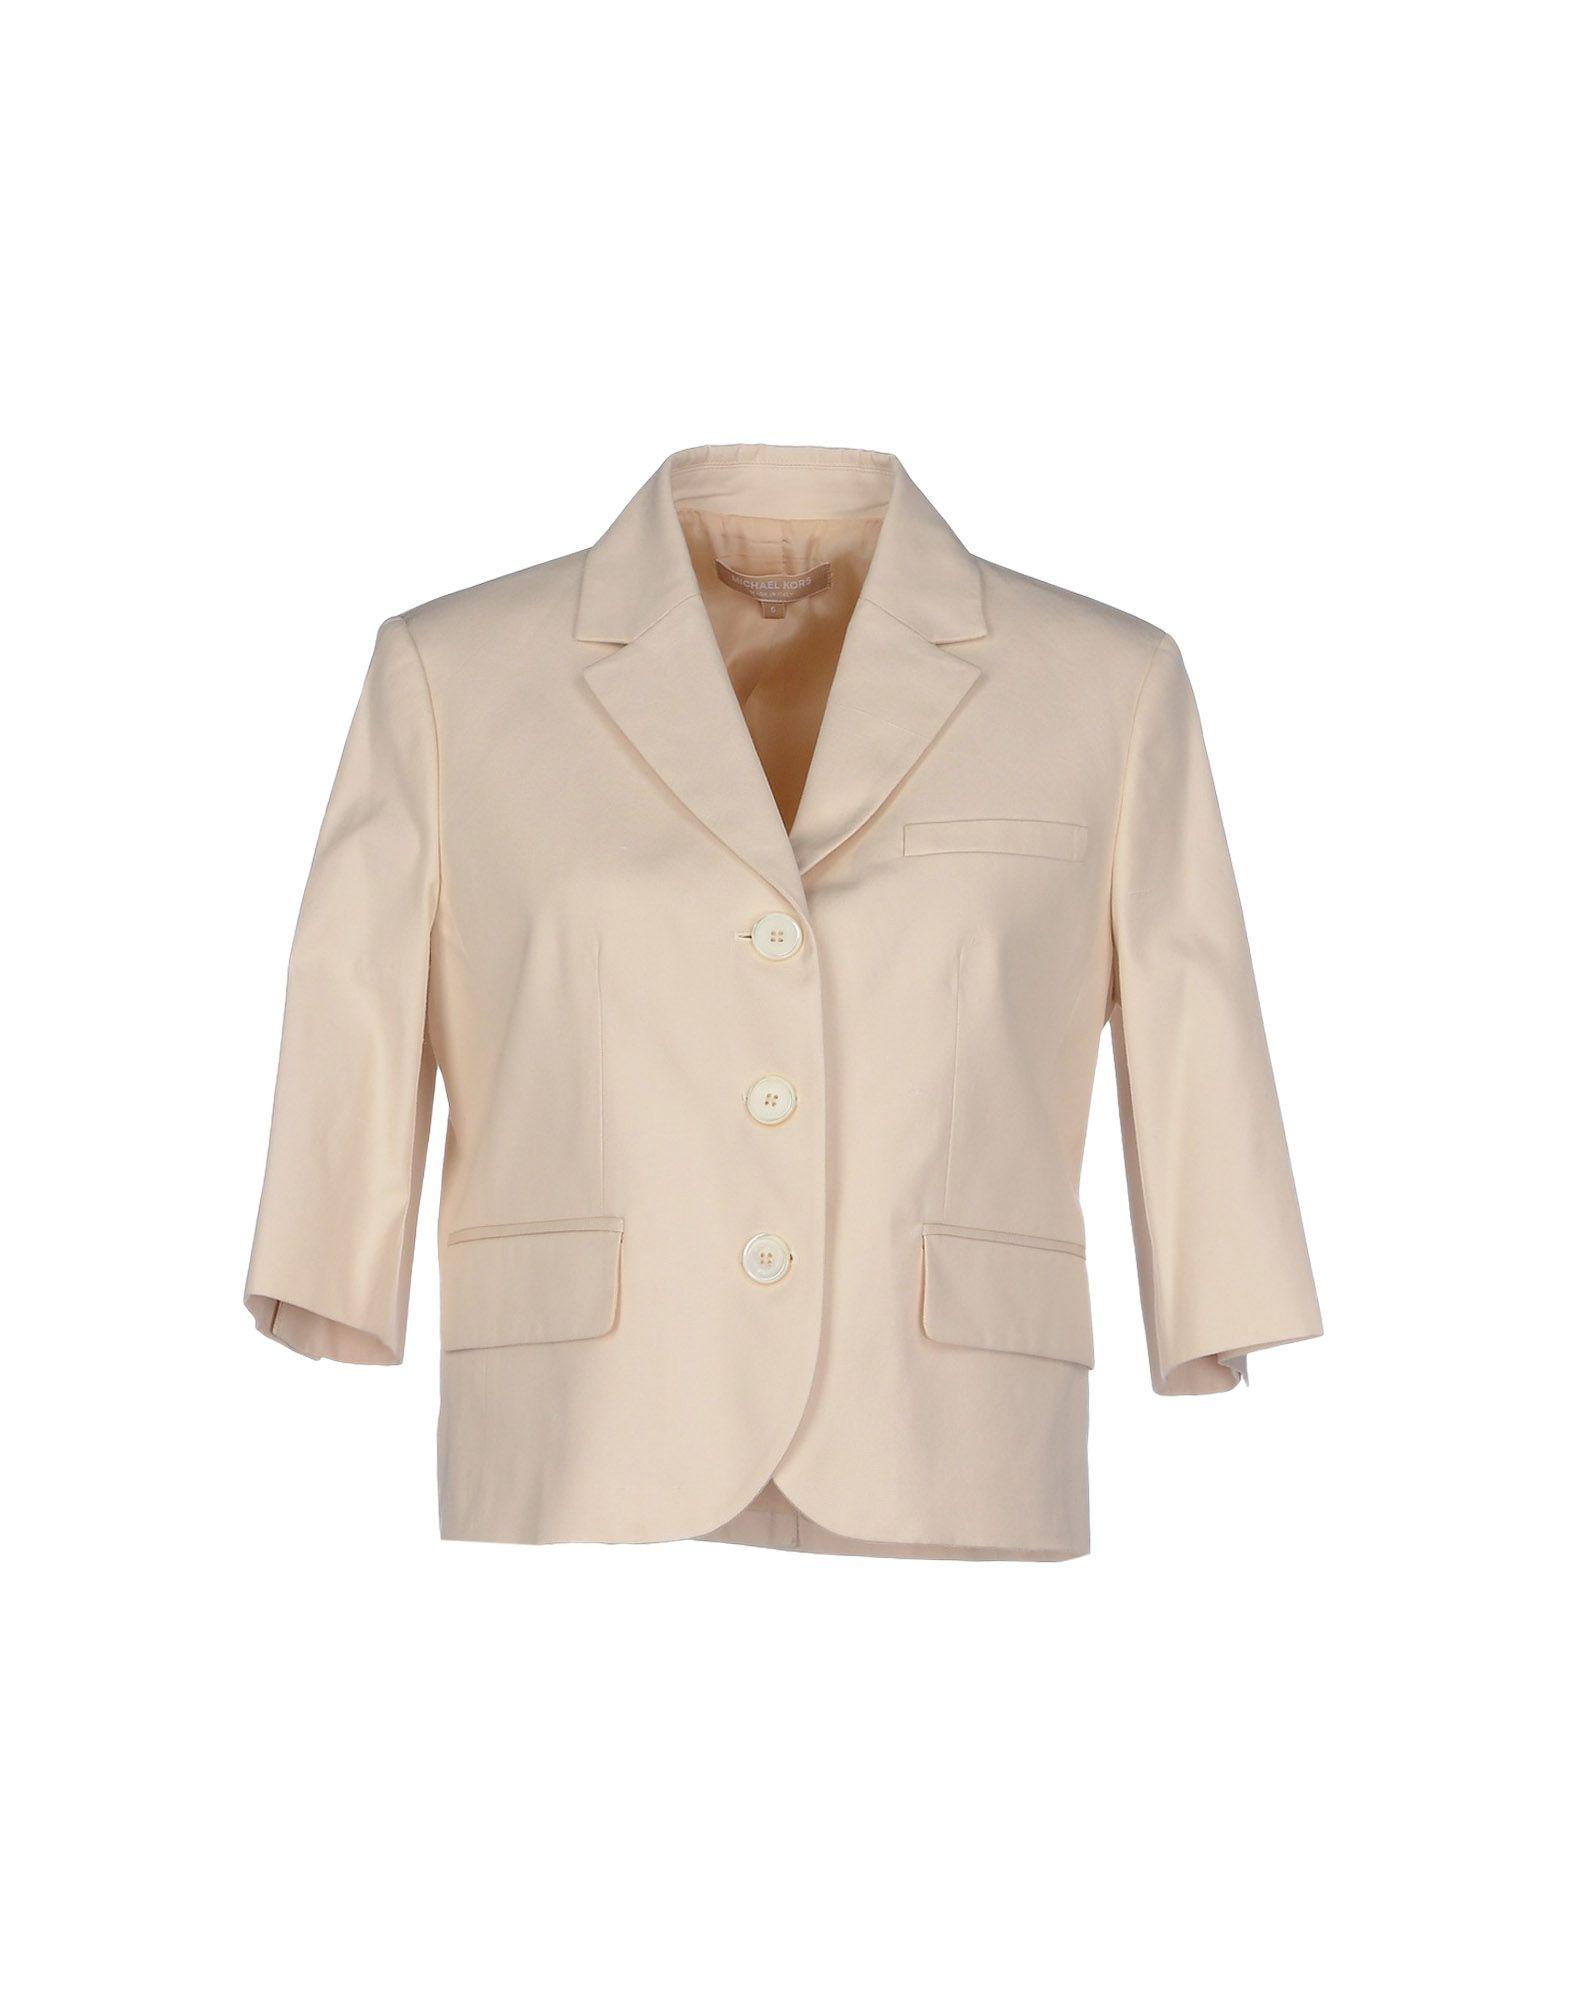 michael kors female michael kors blazers